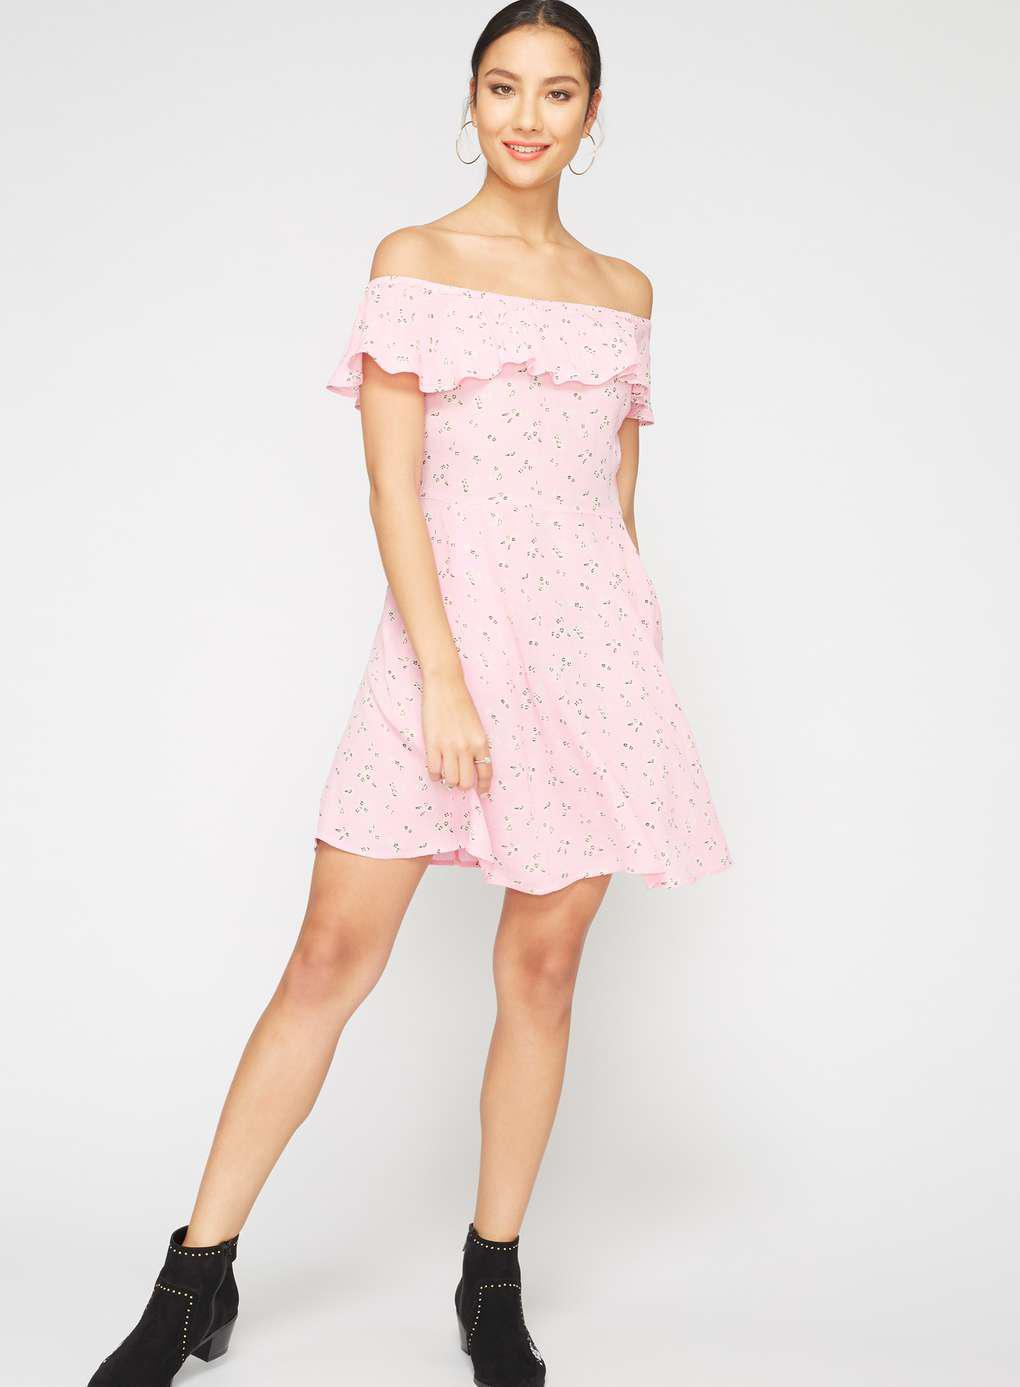 fcf20e317cf Gallery. Previously sold at  Miss Selfridge · Women s Pink Dresses Women s  Skater ...